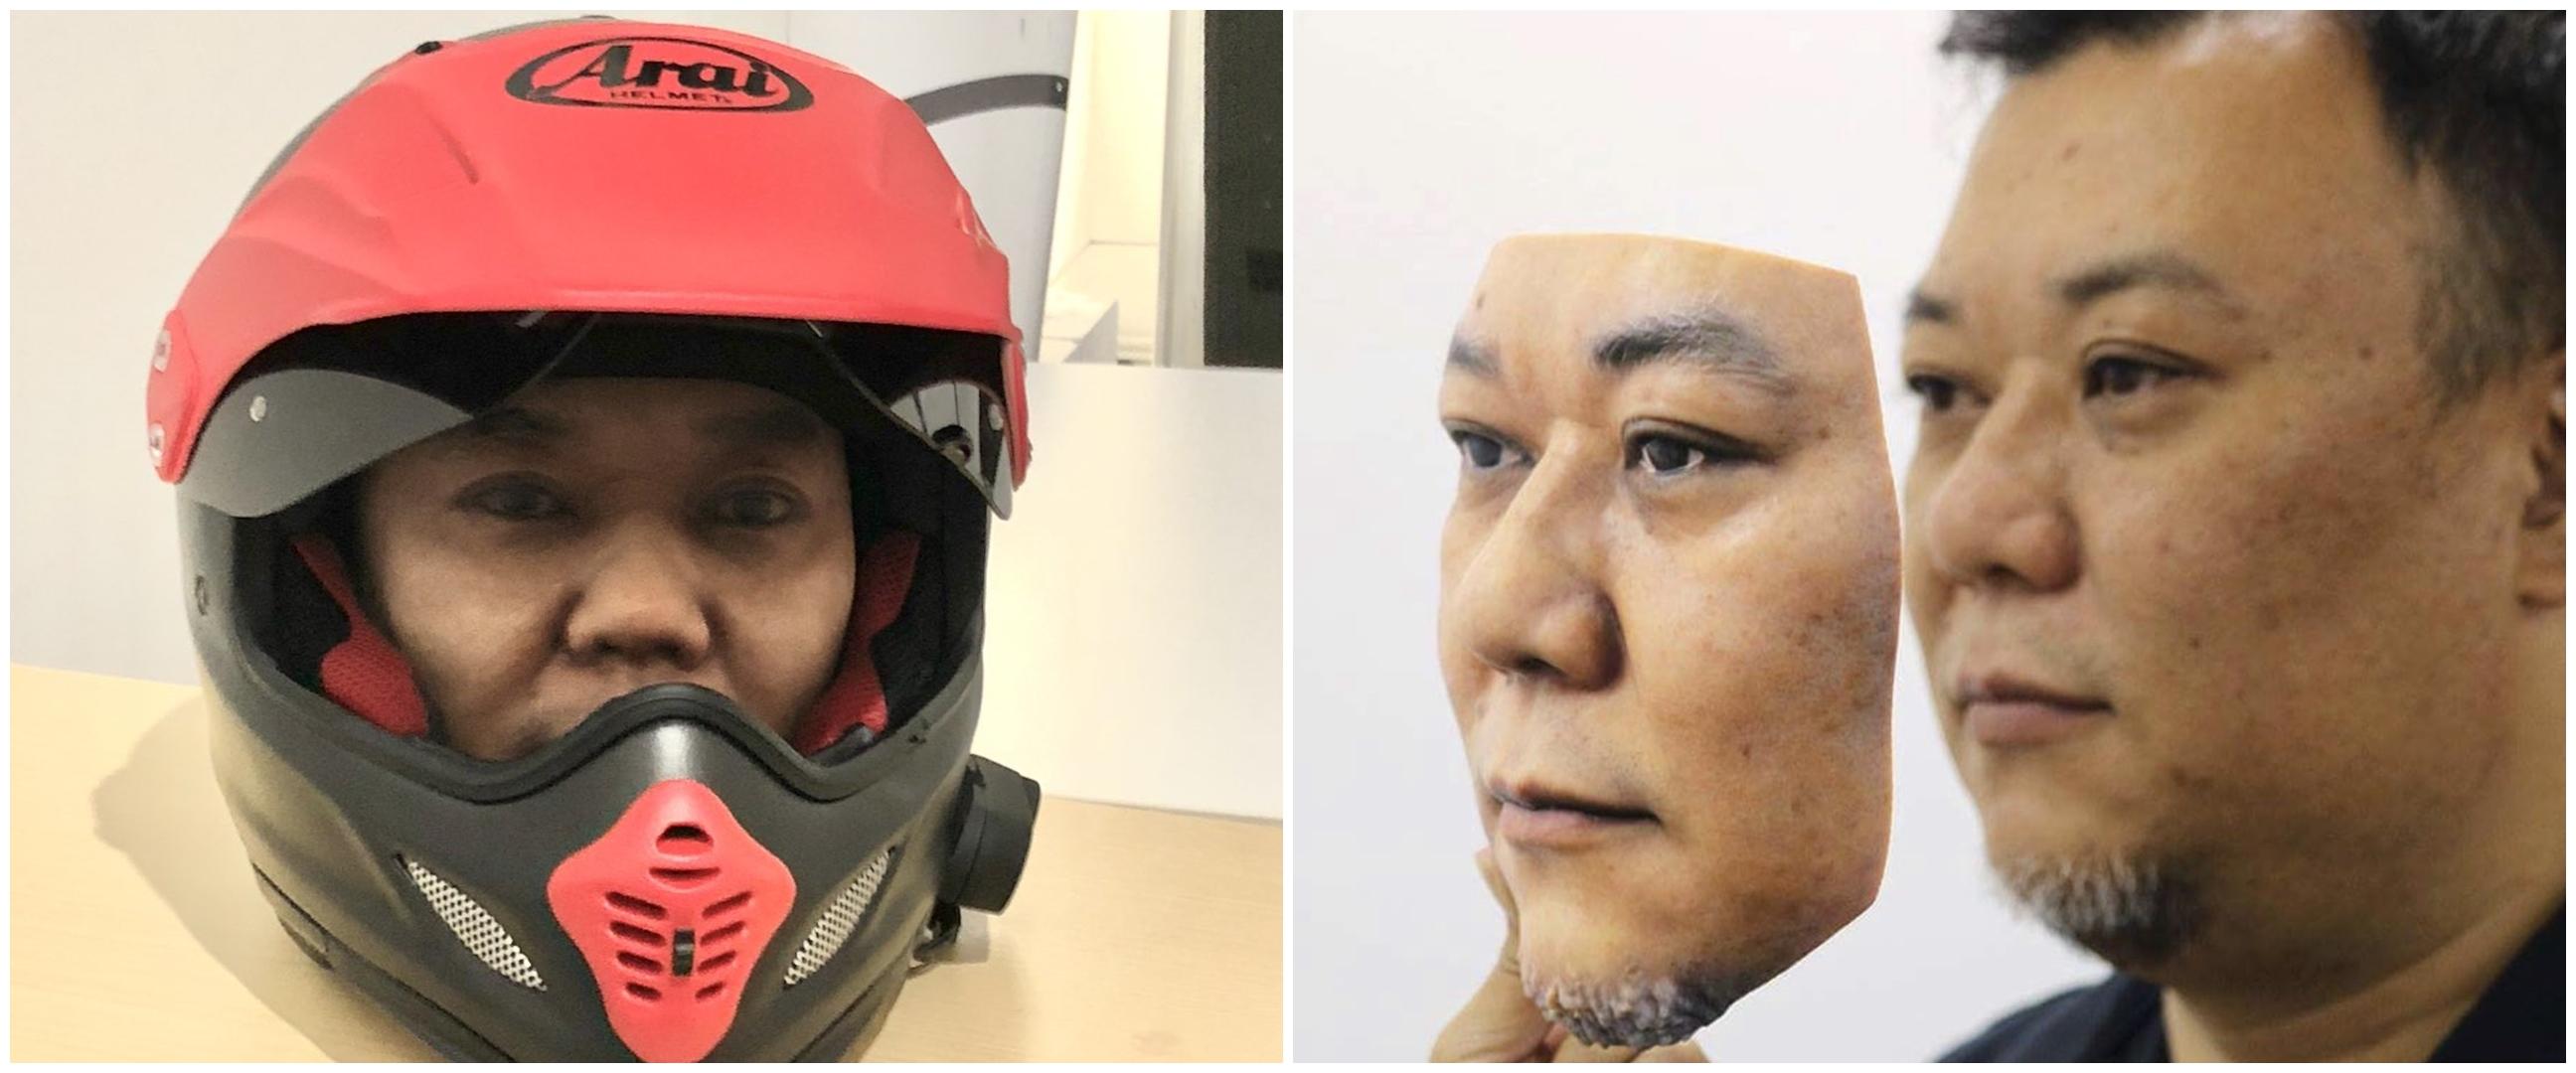 Seniman ini bikin masker topeng 3D, realistis wajah manusia